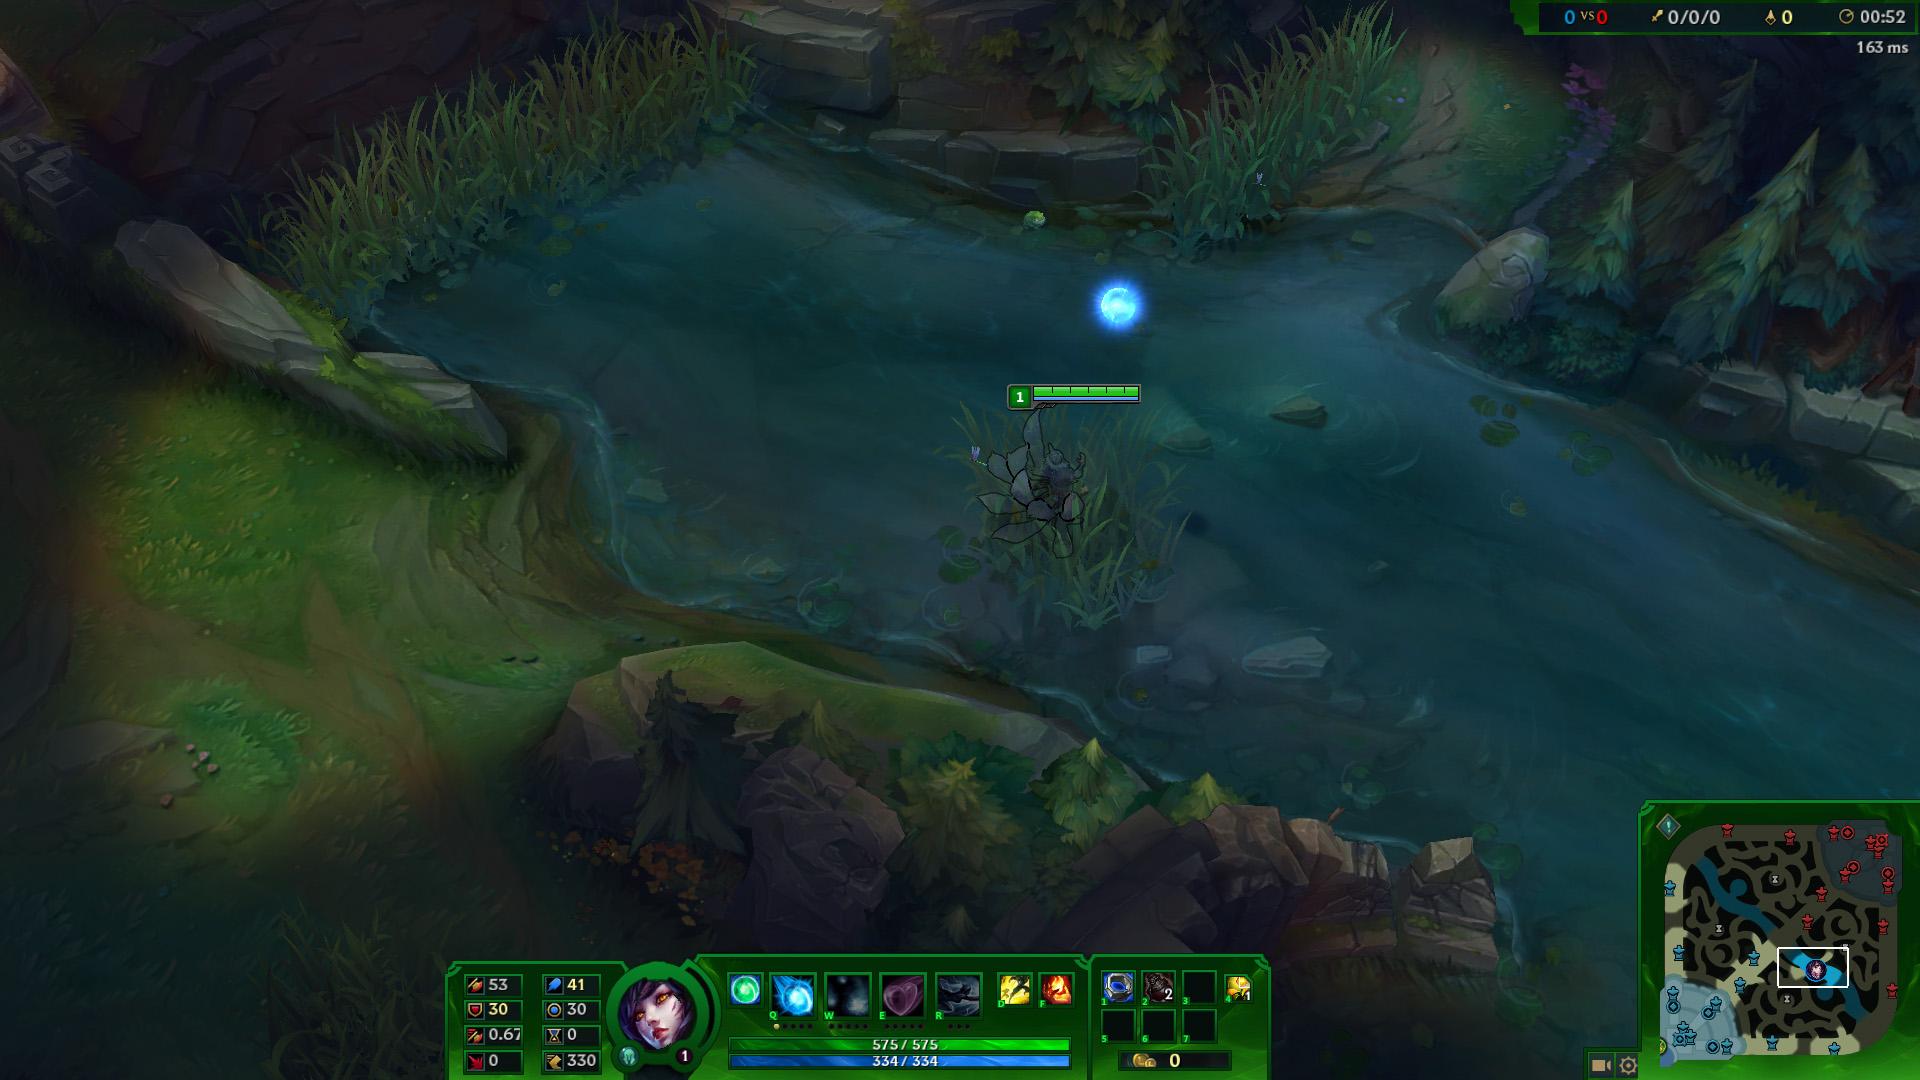 [FREE] Simple Green - Stream Overlay by lol0verlay